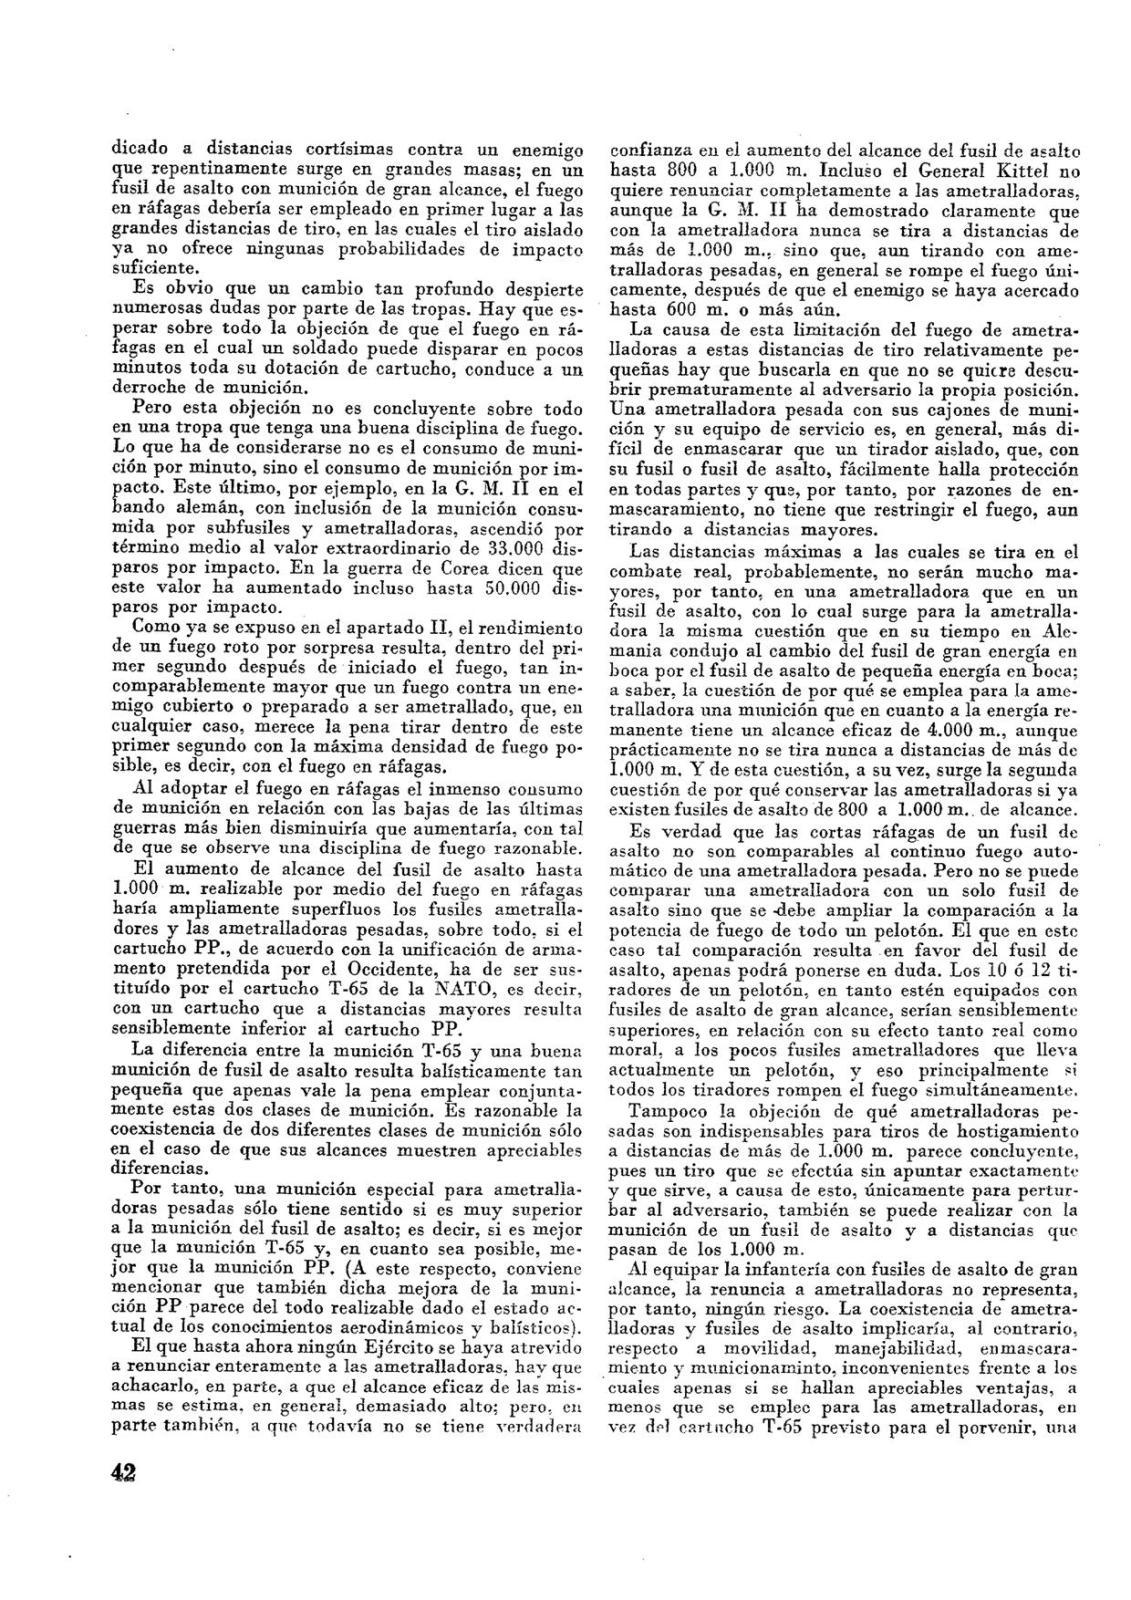 interesante articulo de GÜNTER VOSS 25pr3ab